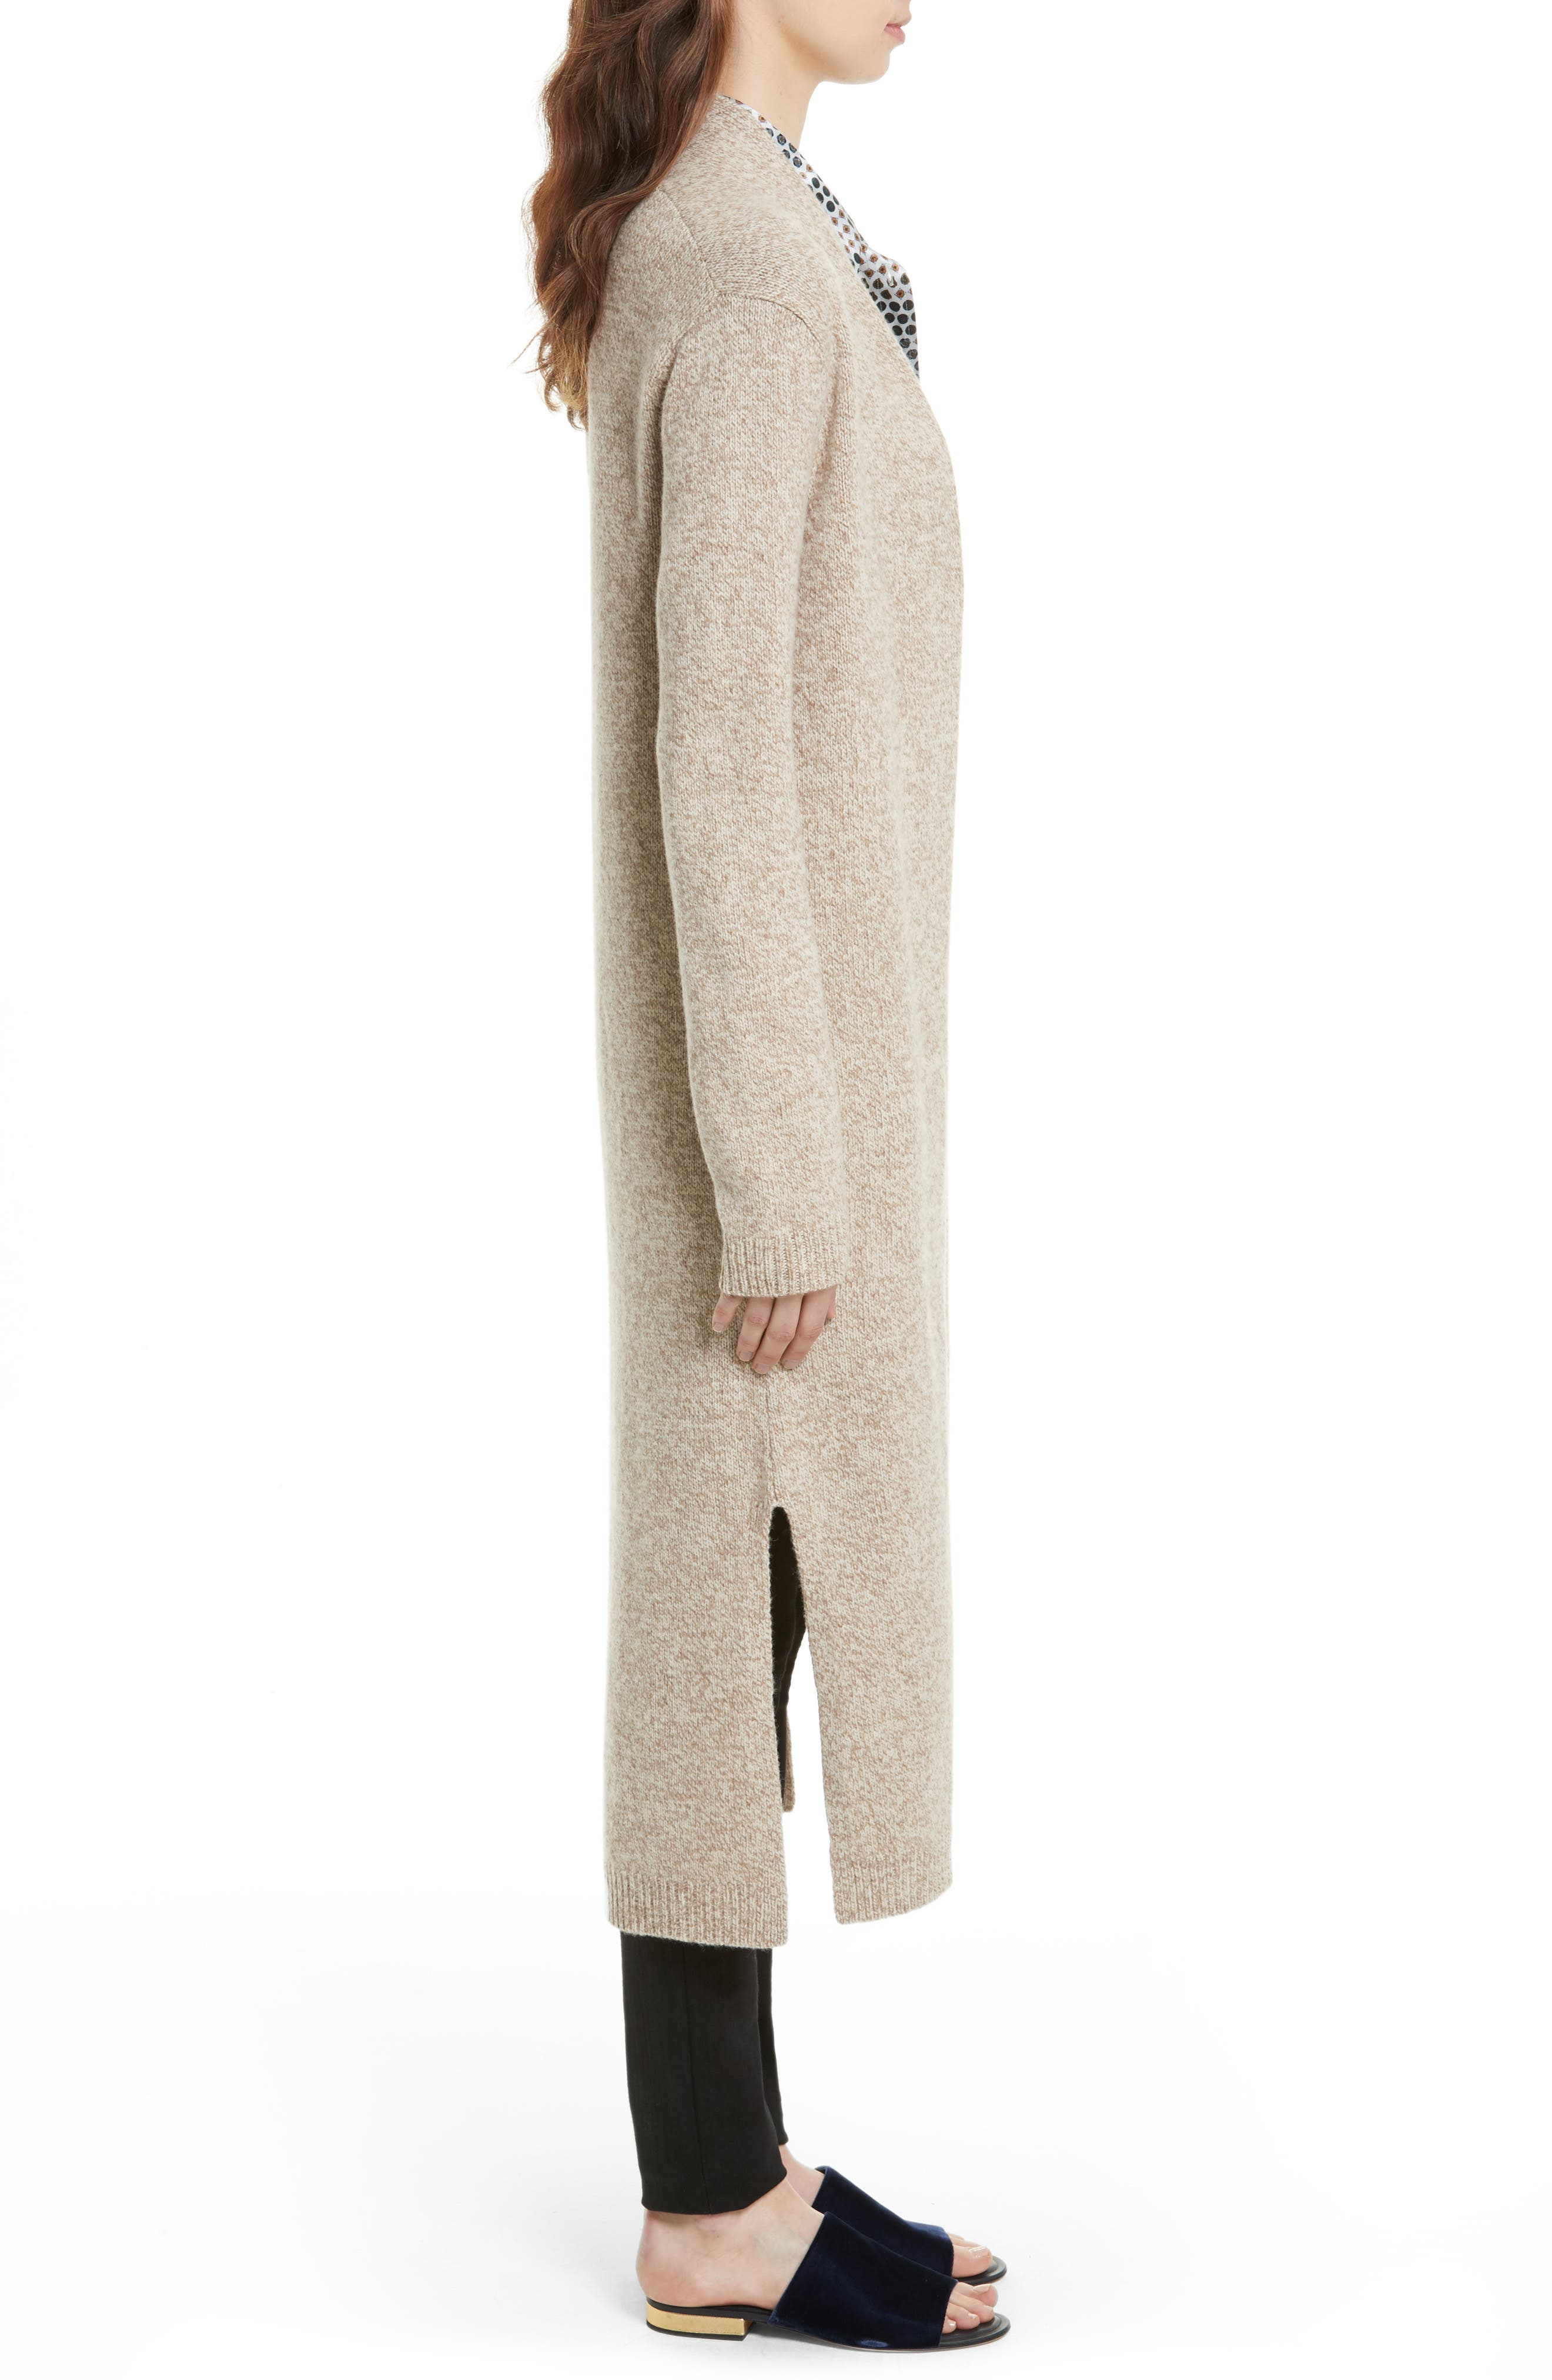 Thoren Long Wool Cardigan,                             Alternate thumbnail 3, color,                             Oatmeal Multi